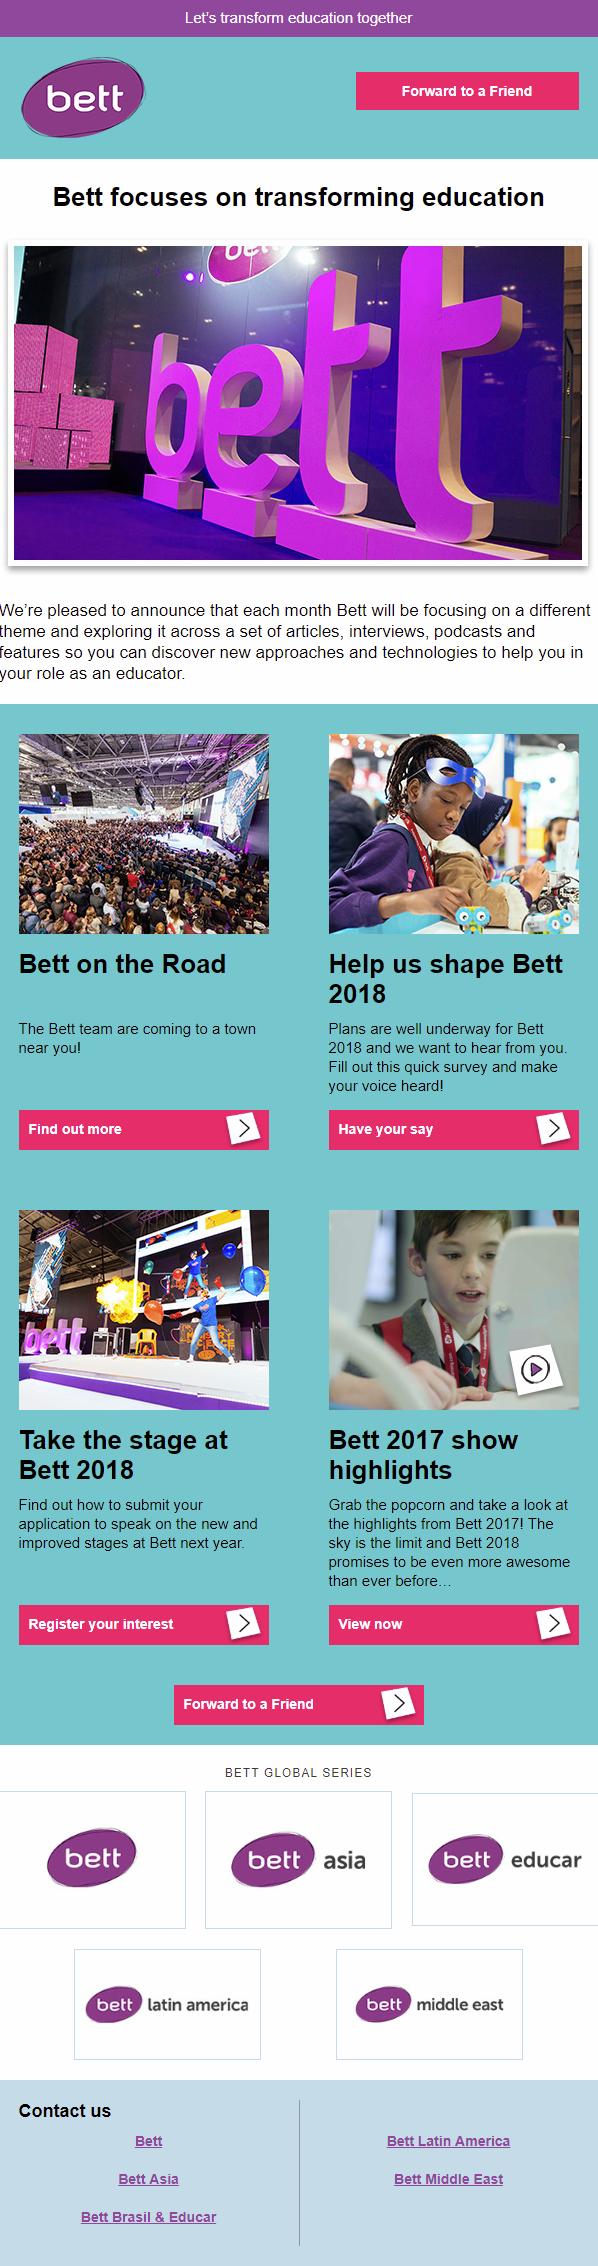 Newsletter-Big-Bett-news,-read-all-about-it!.png